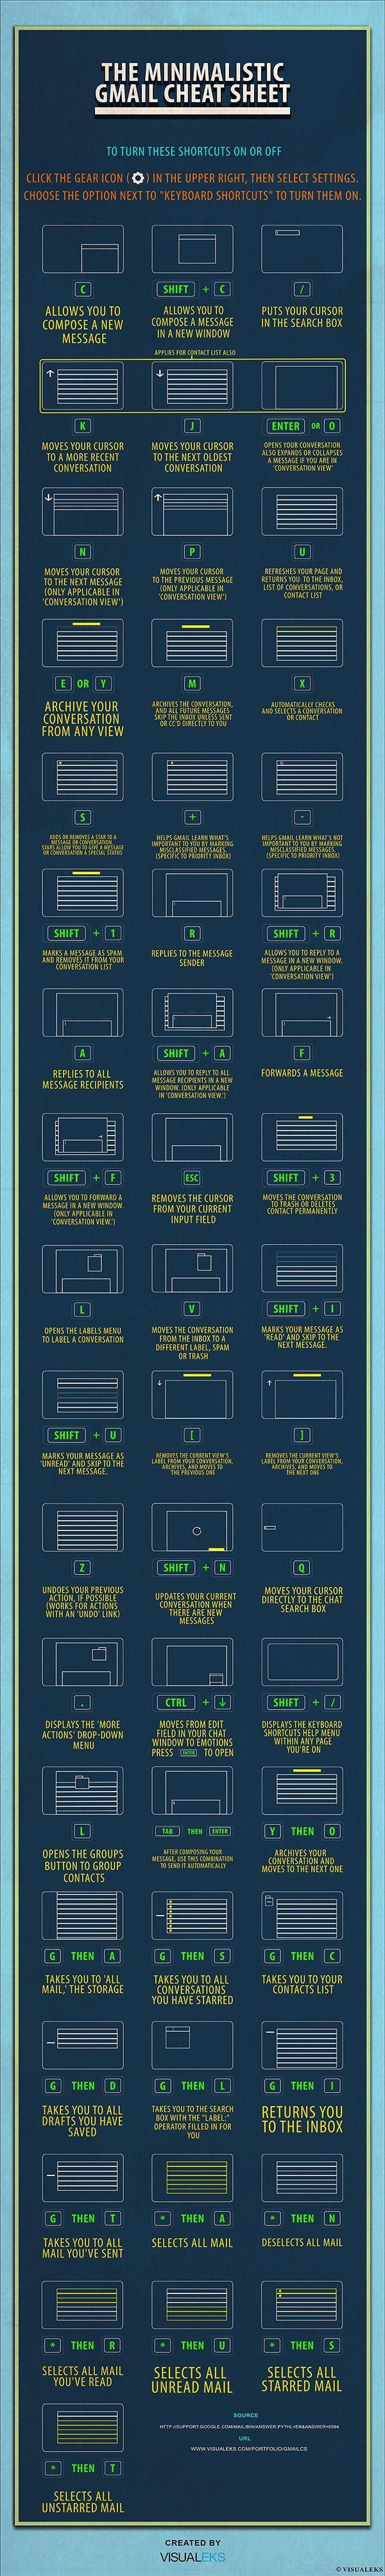 A Gmail cheat sheet - lots of shortcuts and fun things.